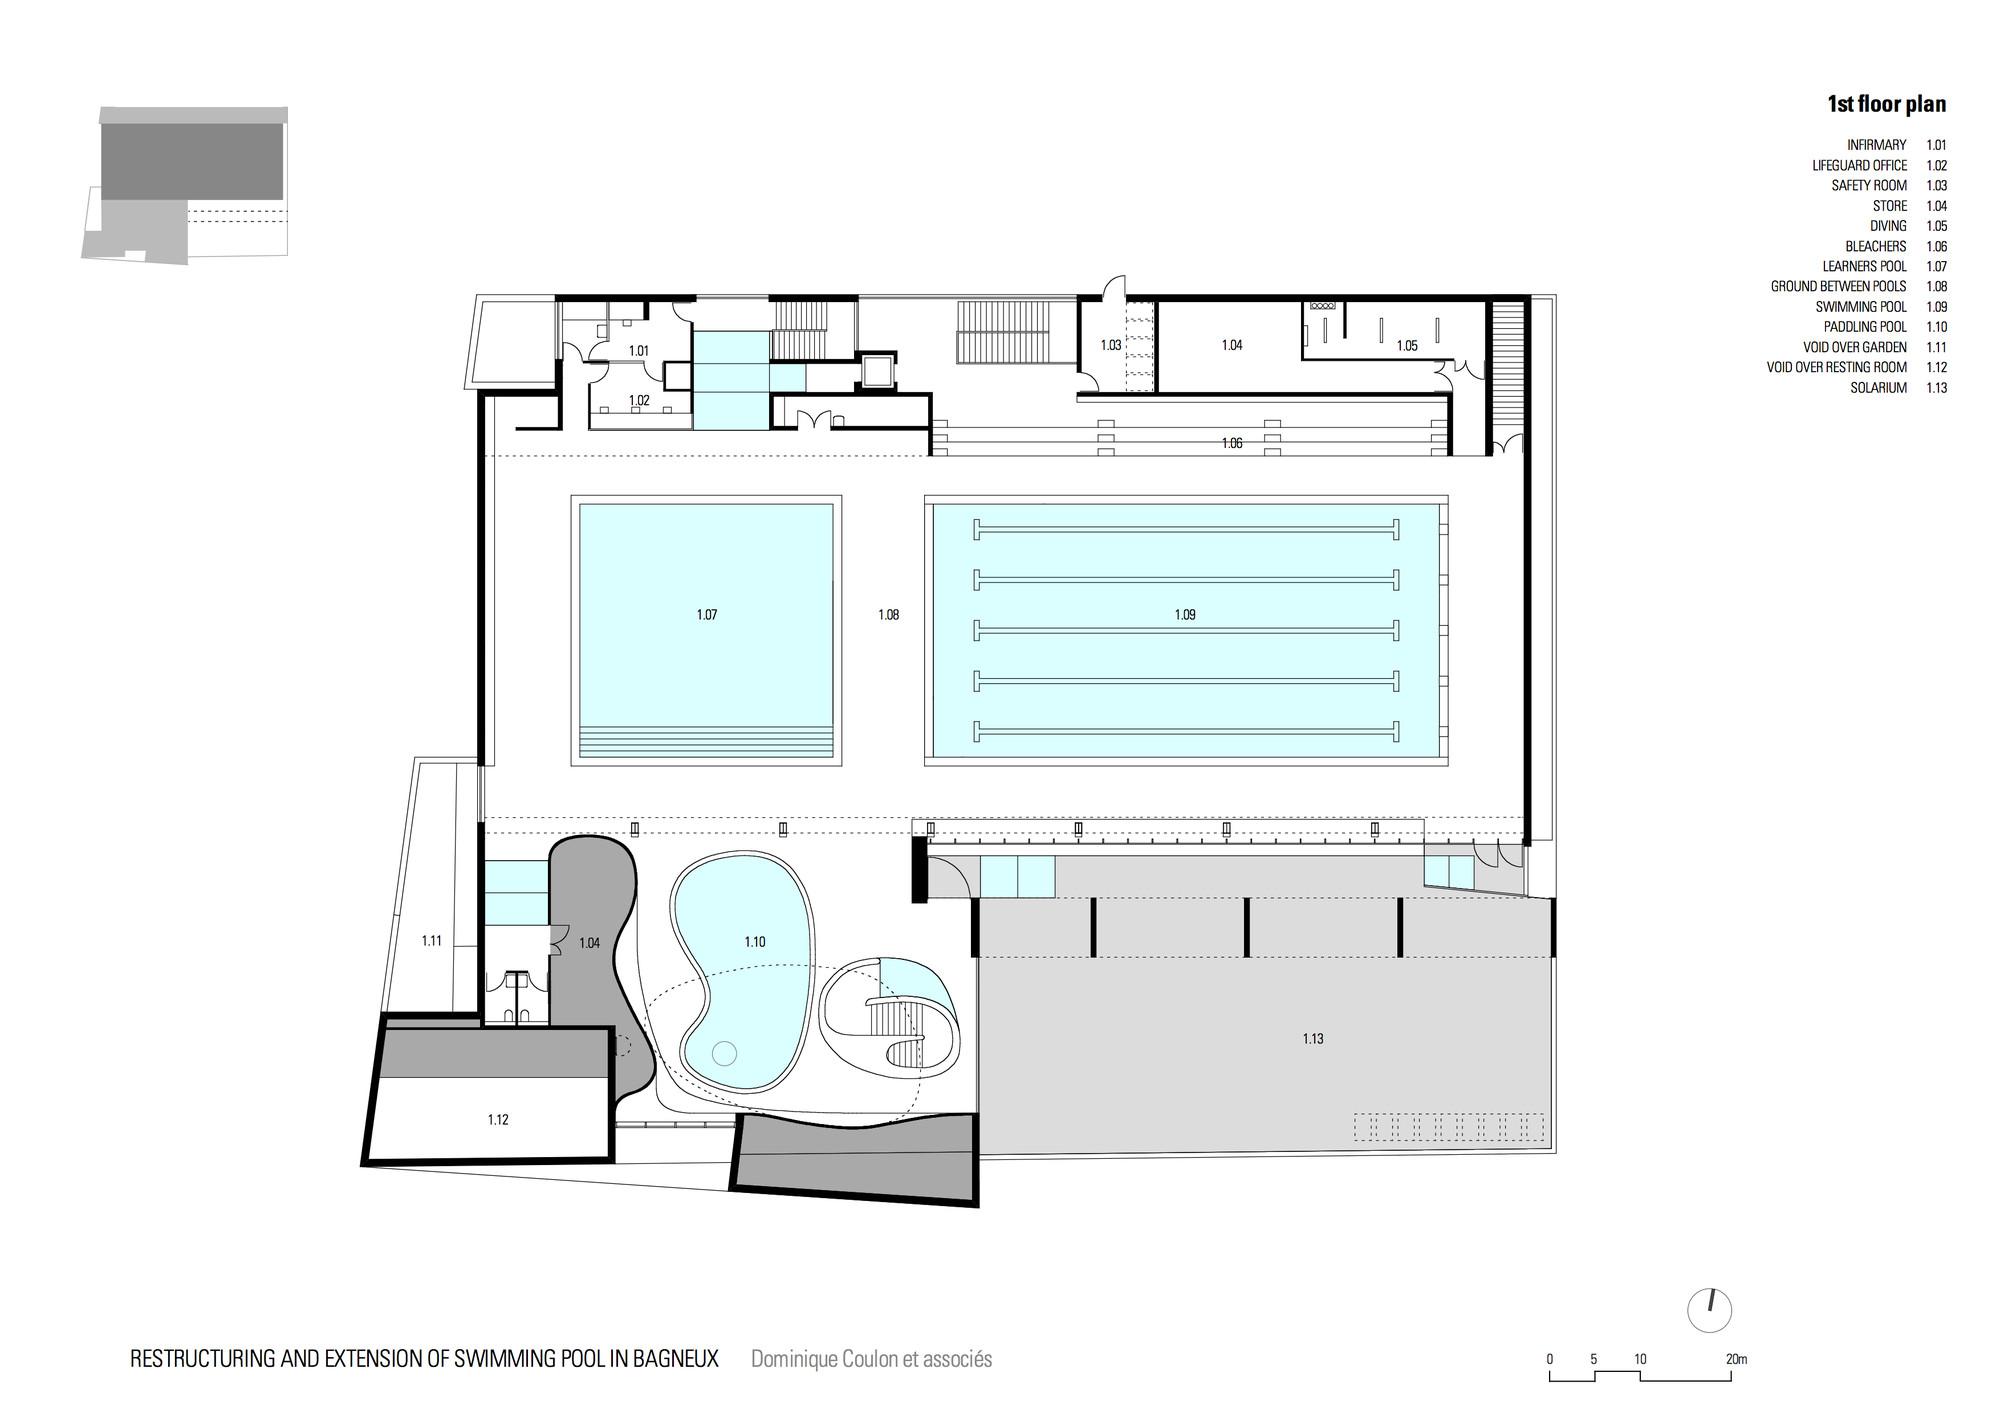 547d3ad2e58ece91b8000089 Floor Plan on Swimming Pool Plan Drawing